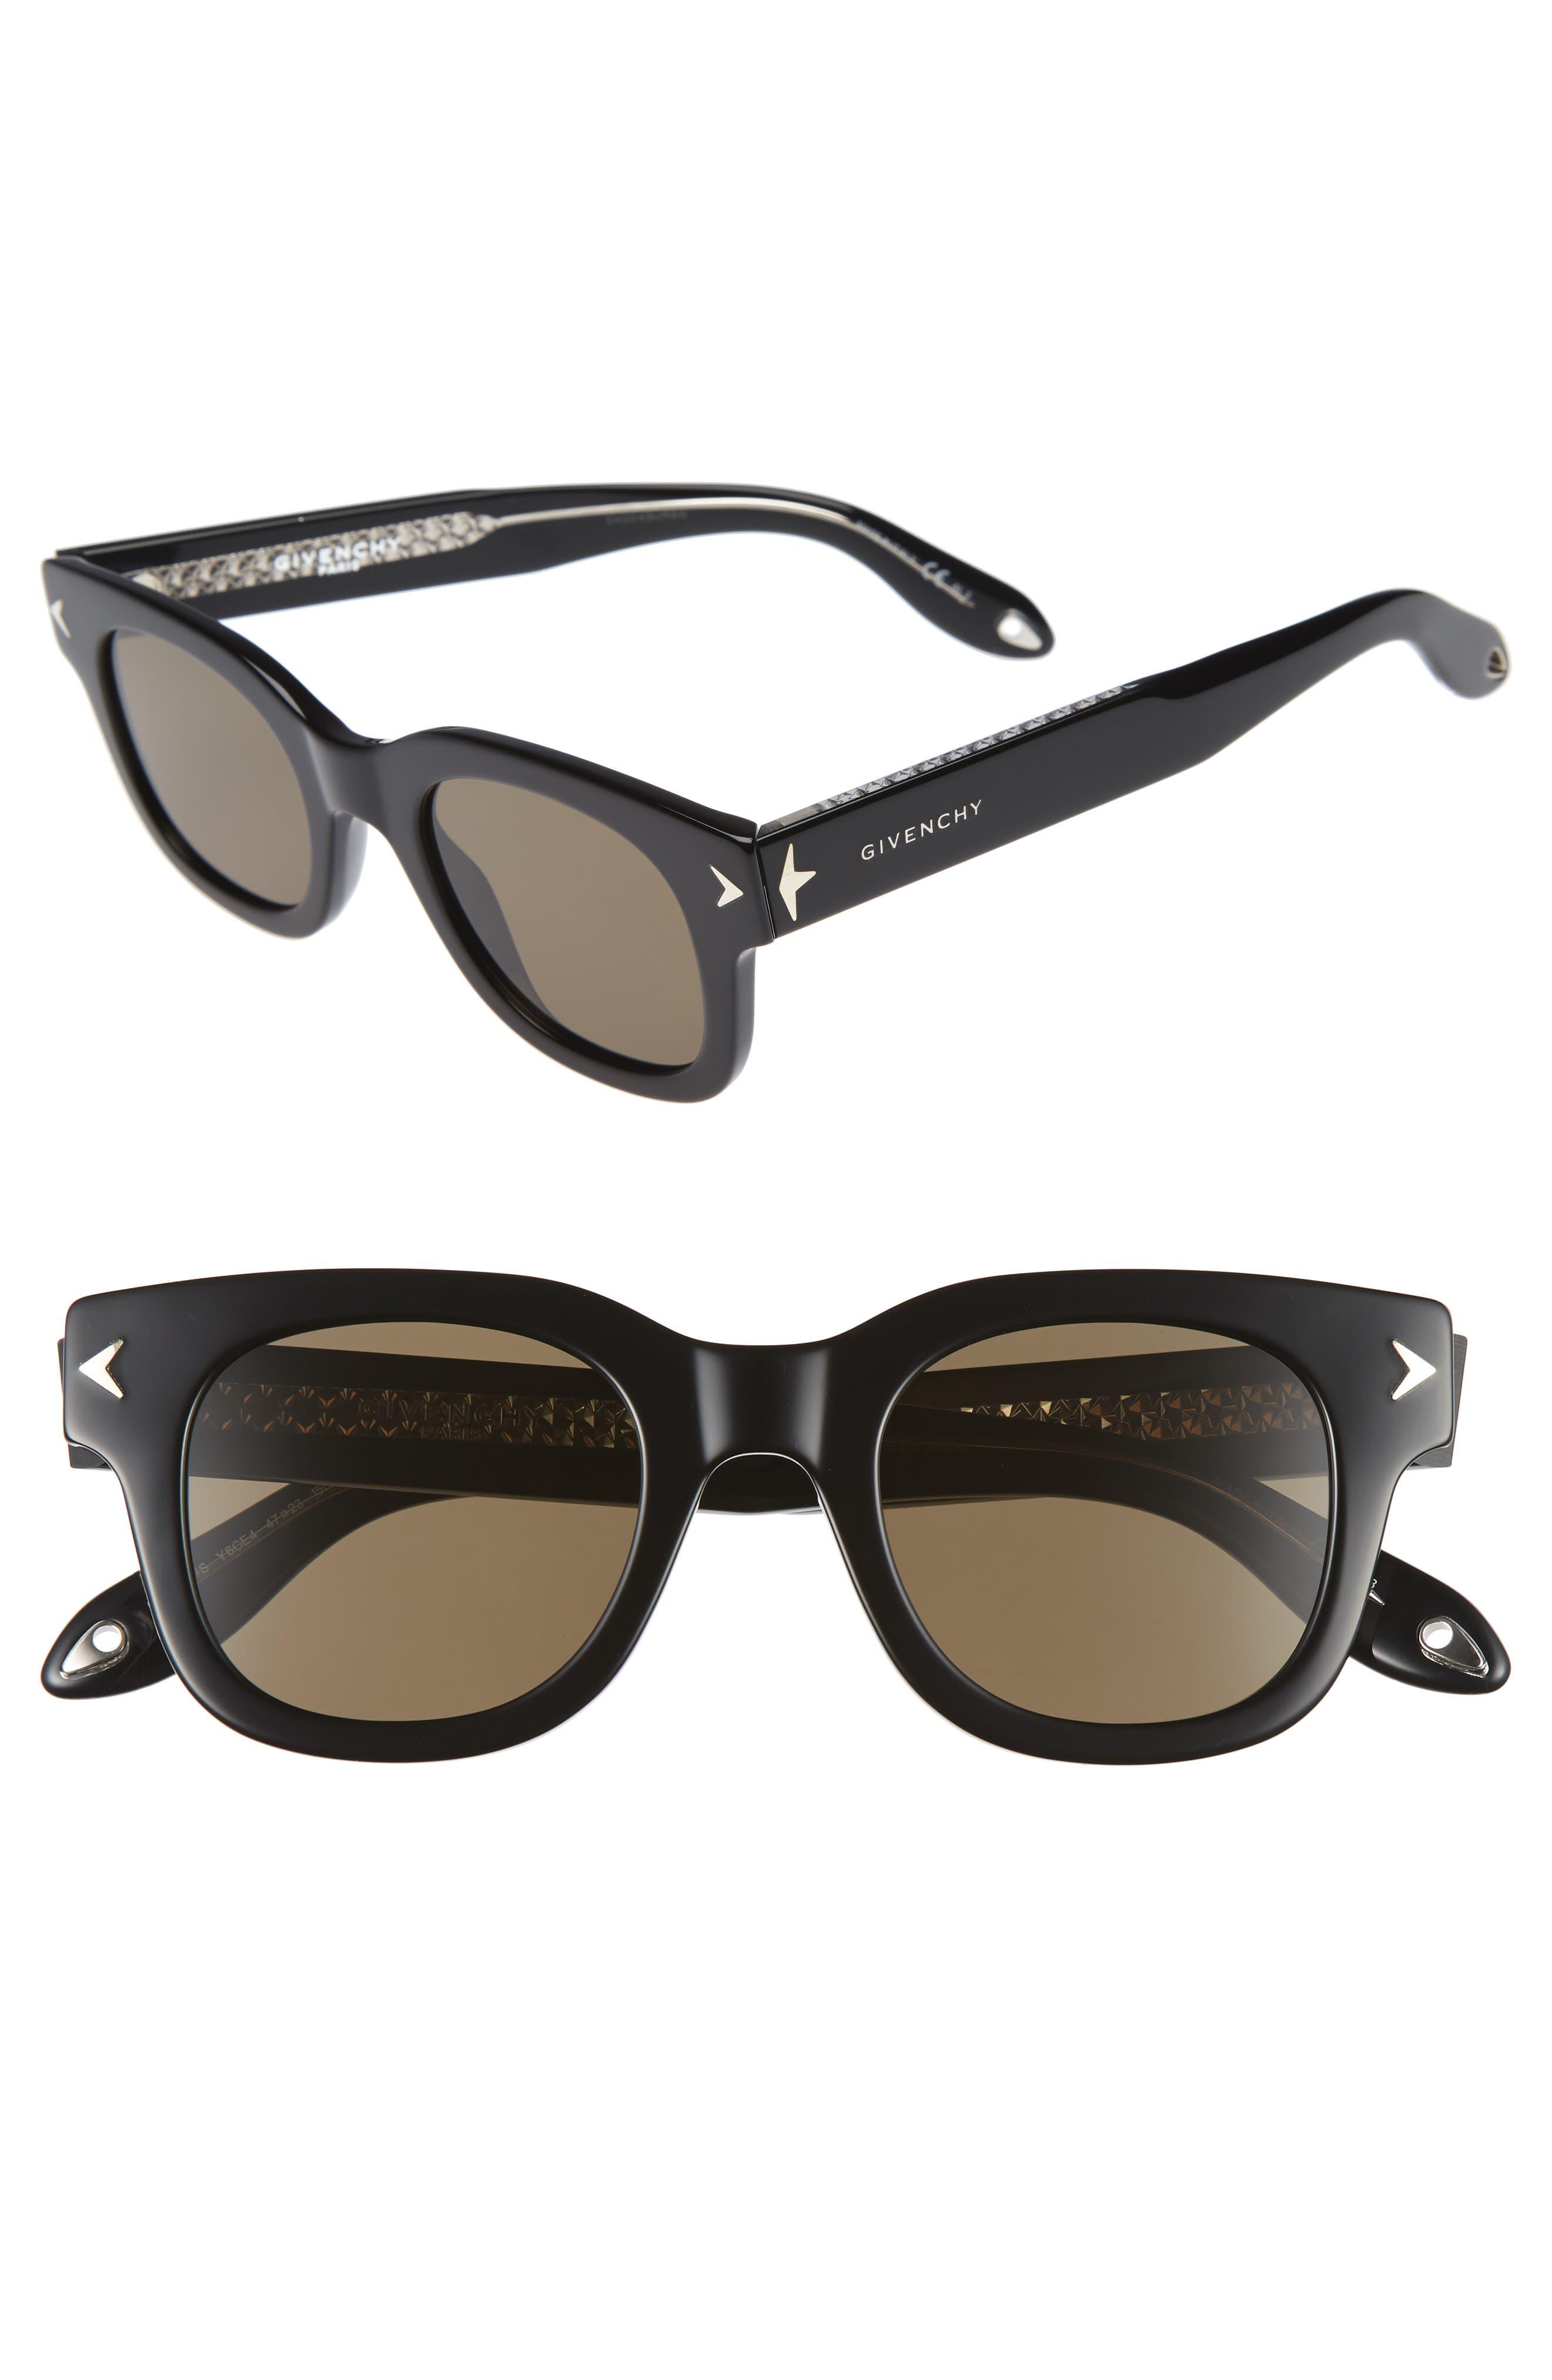 7037/S 47mm Sunglasses,                         Main,                         color,